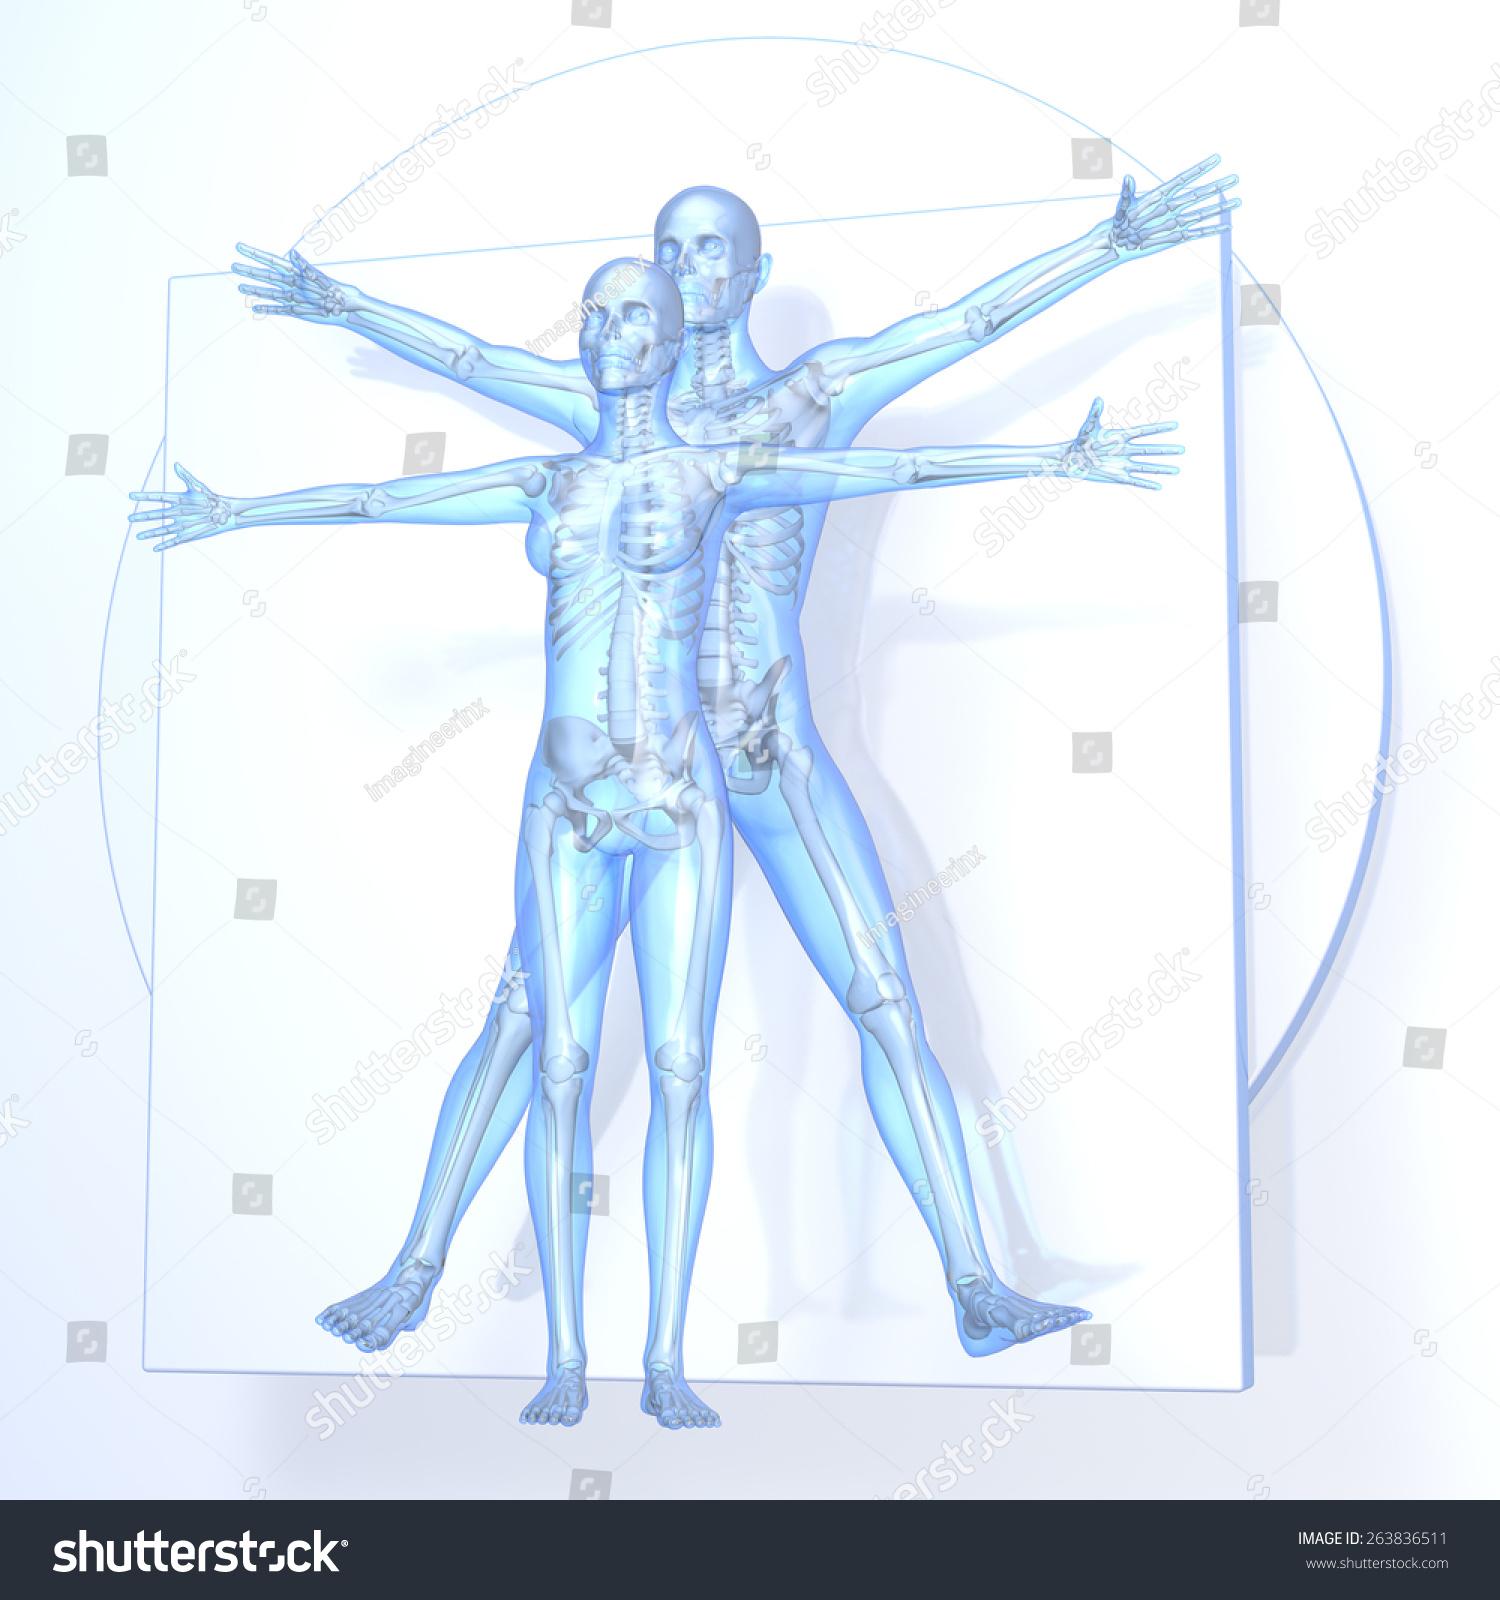 Leonardo Da Vinci Vitruvian Man Woman Stock Illustration 263836511 ...